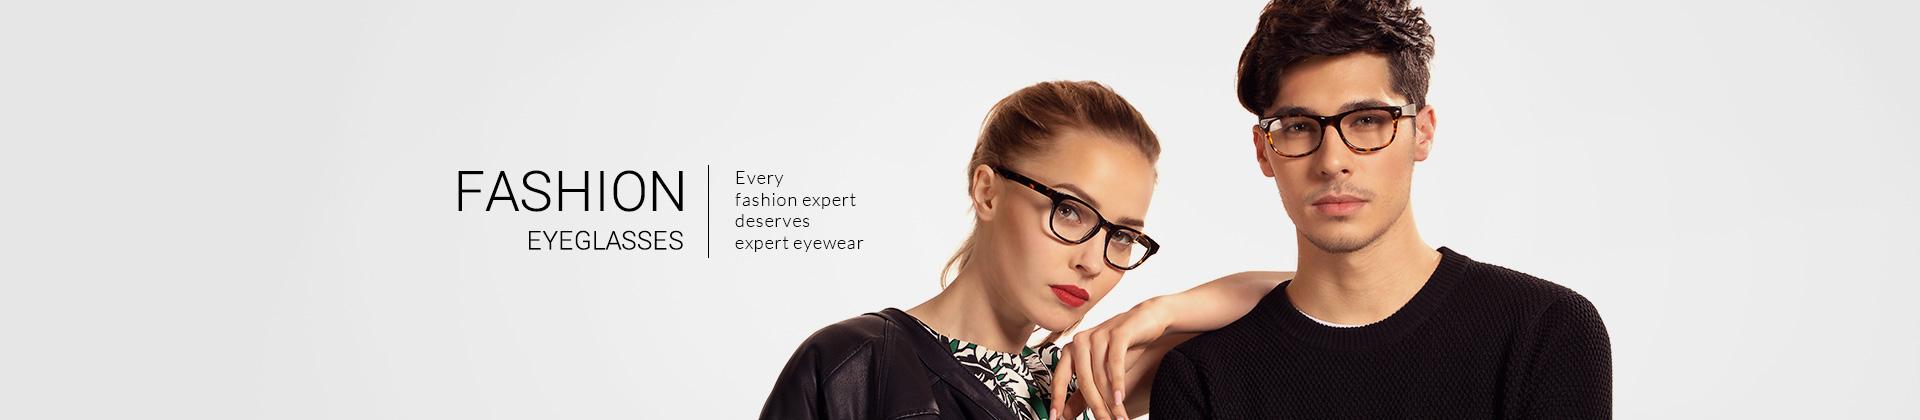 Every fashion expert deserves expert eyewear